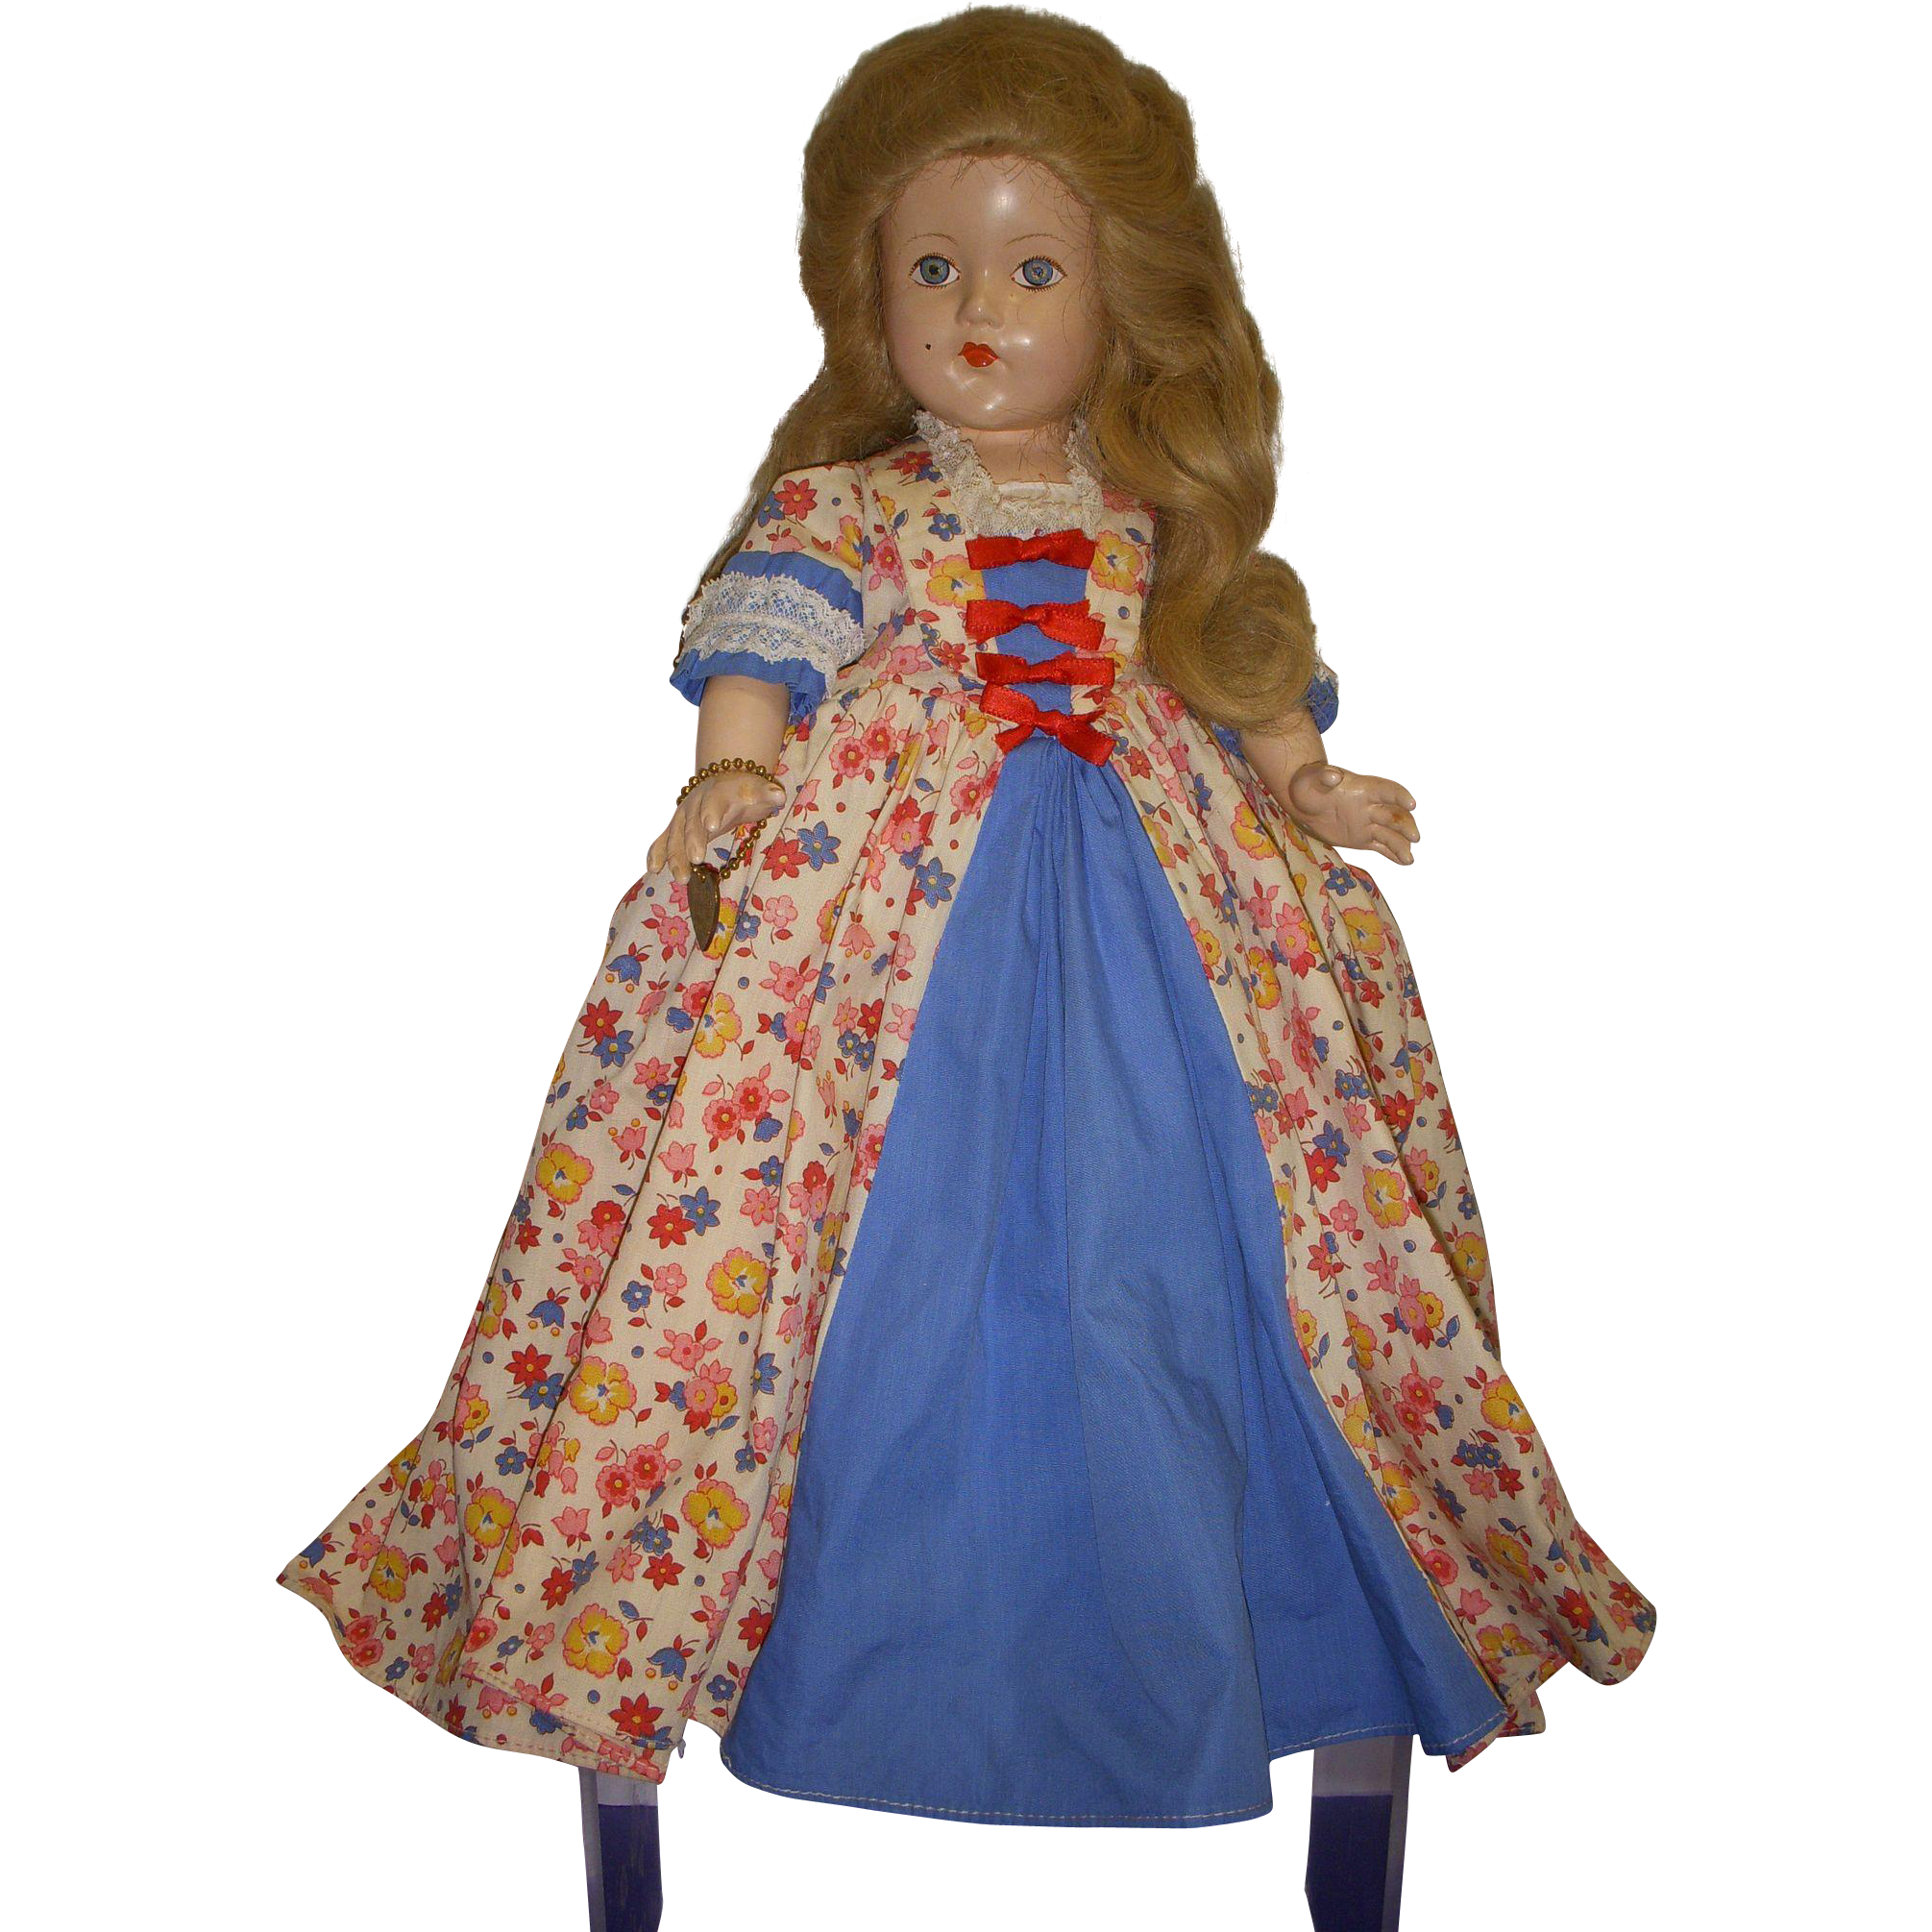 Vintage Effanbee Historical Doll All Original